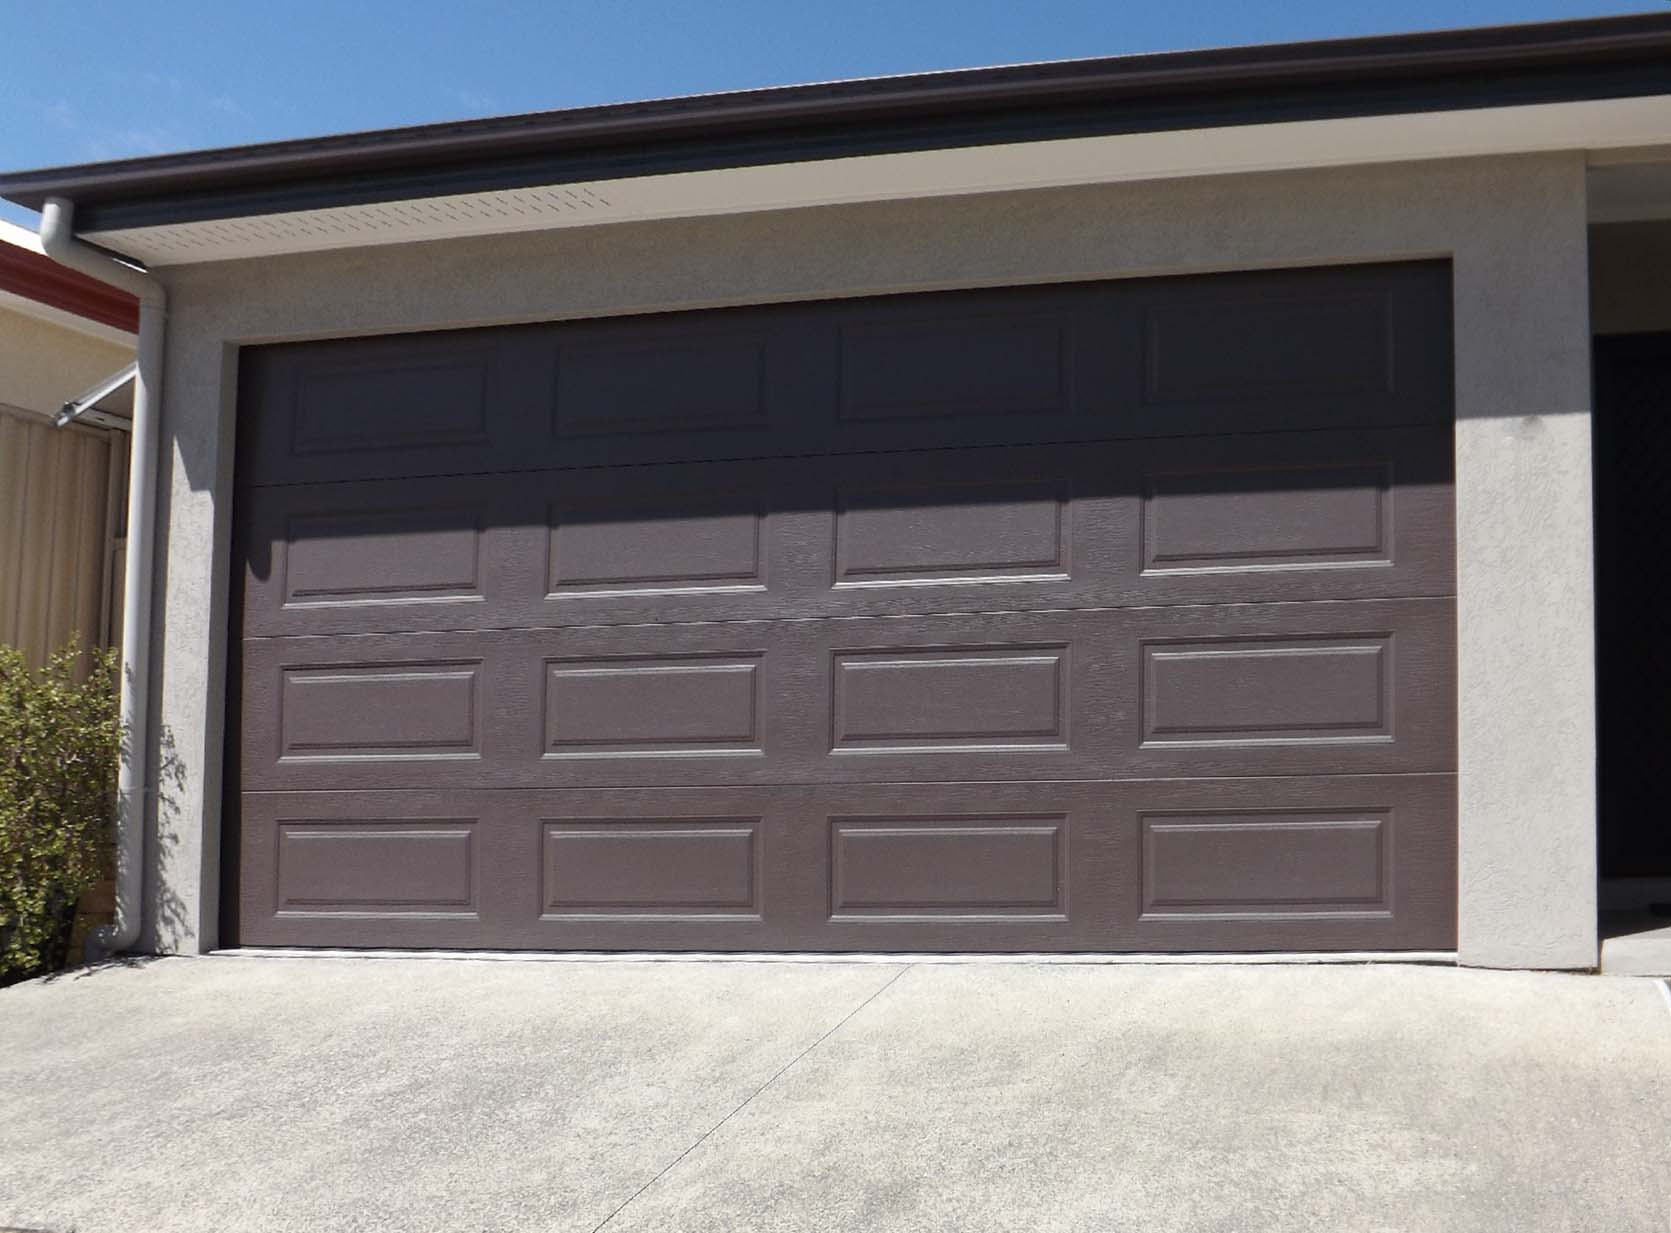 how to take apart a garage door